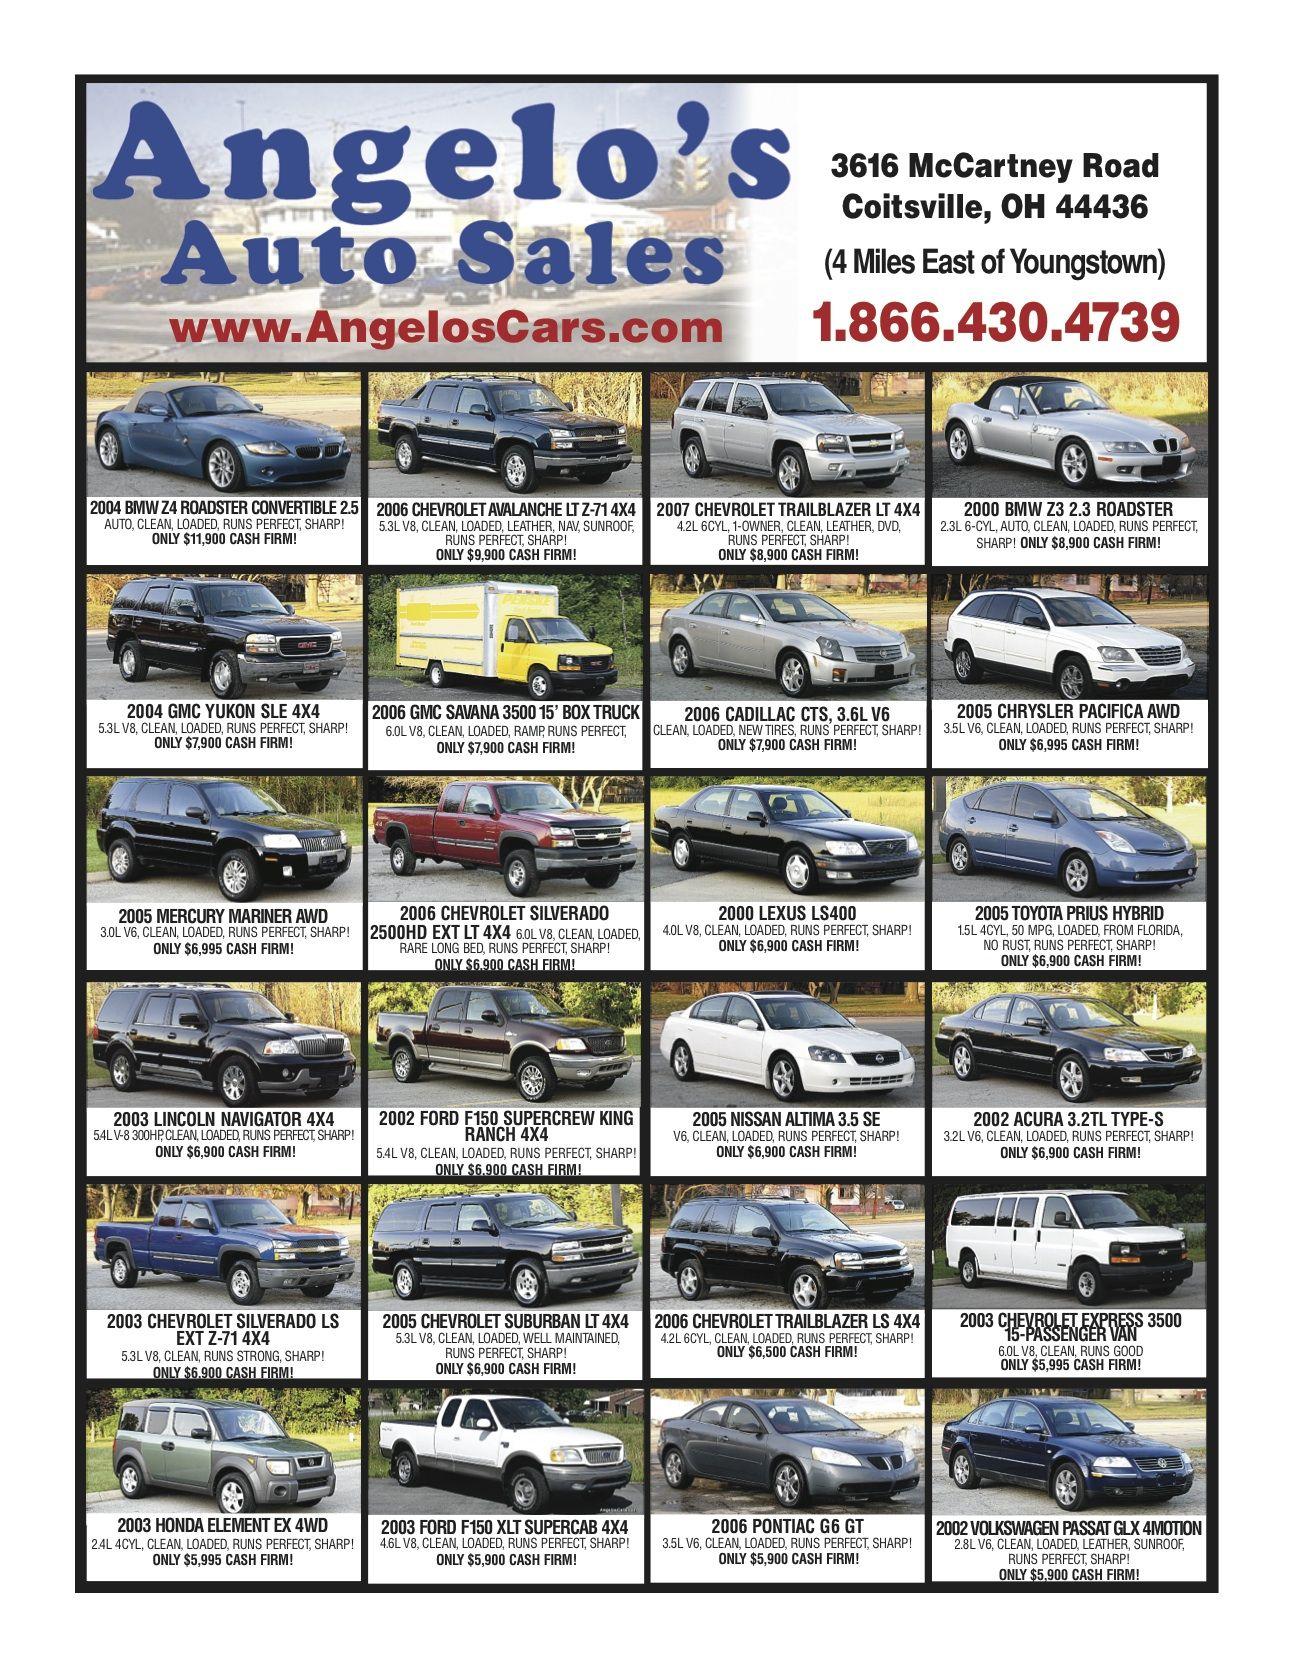 Angelo\'s Auto Sales | Drive Magazine - Issue 1, 2013 | Pinterest ...